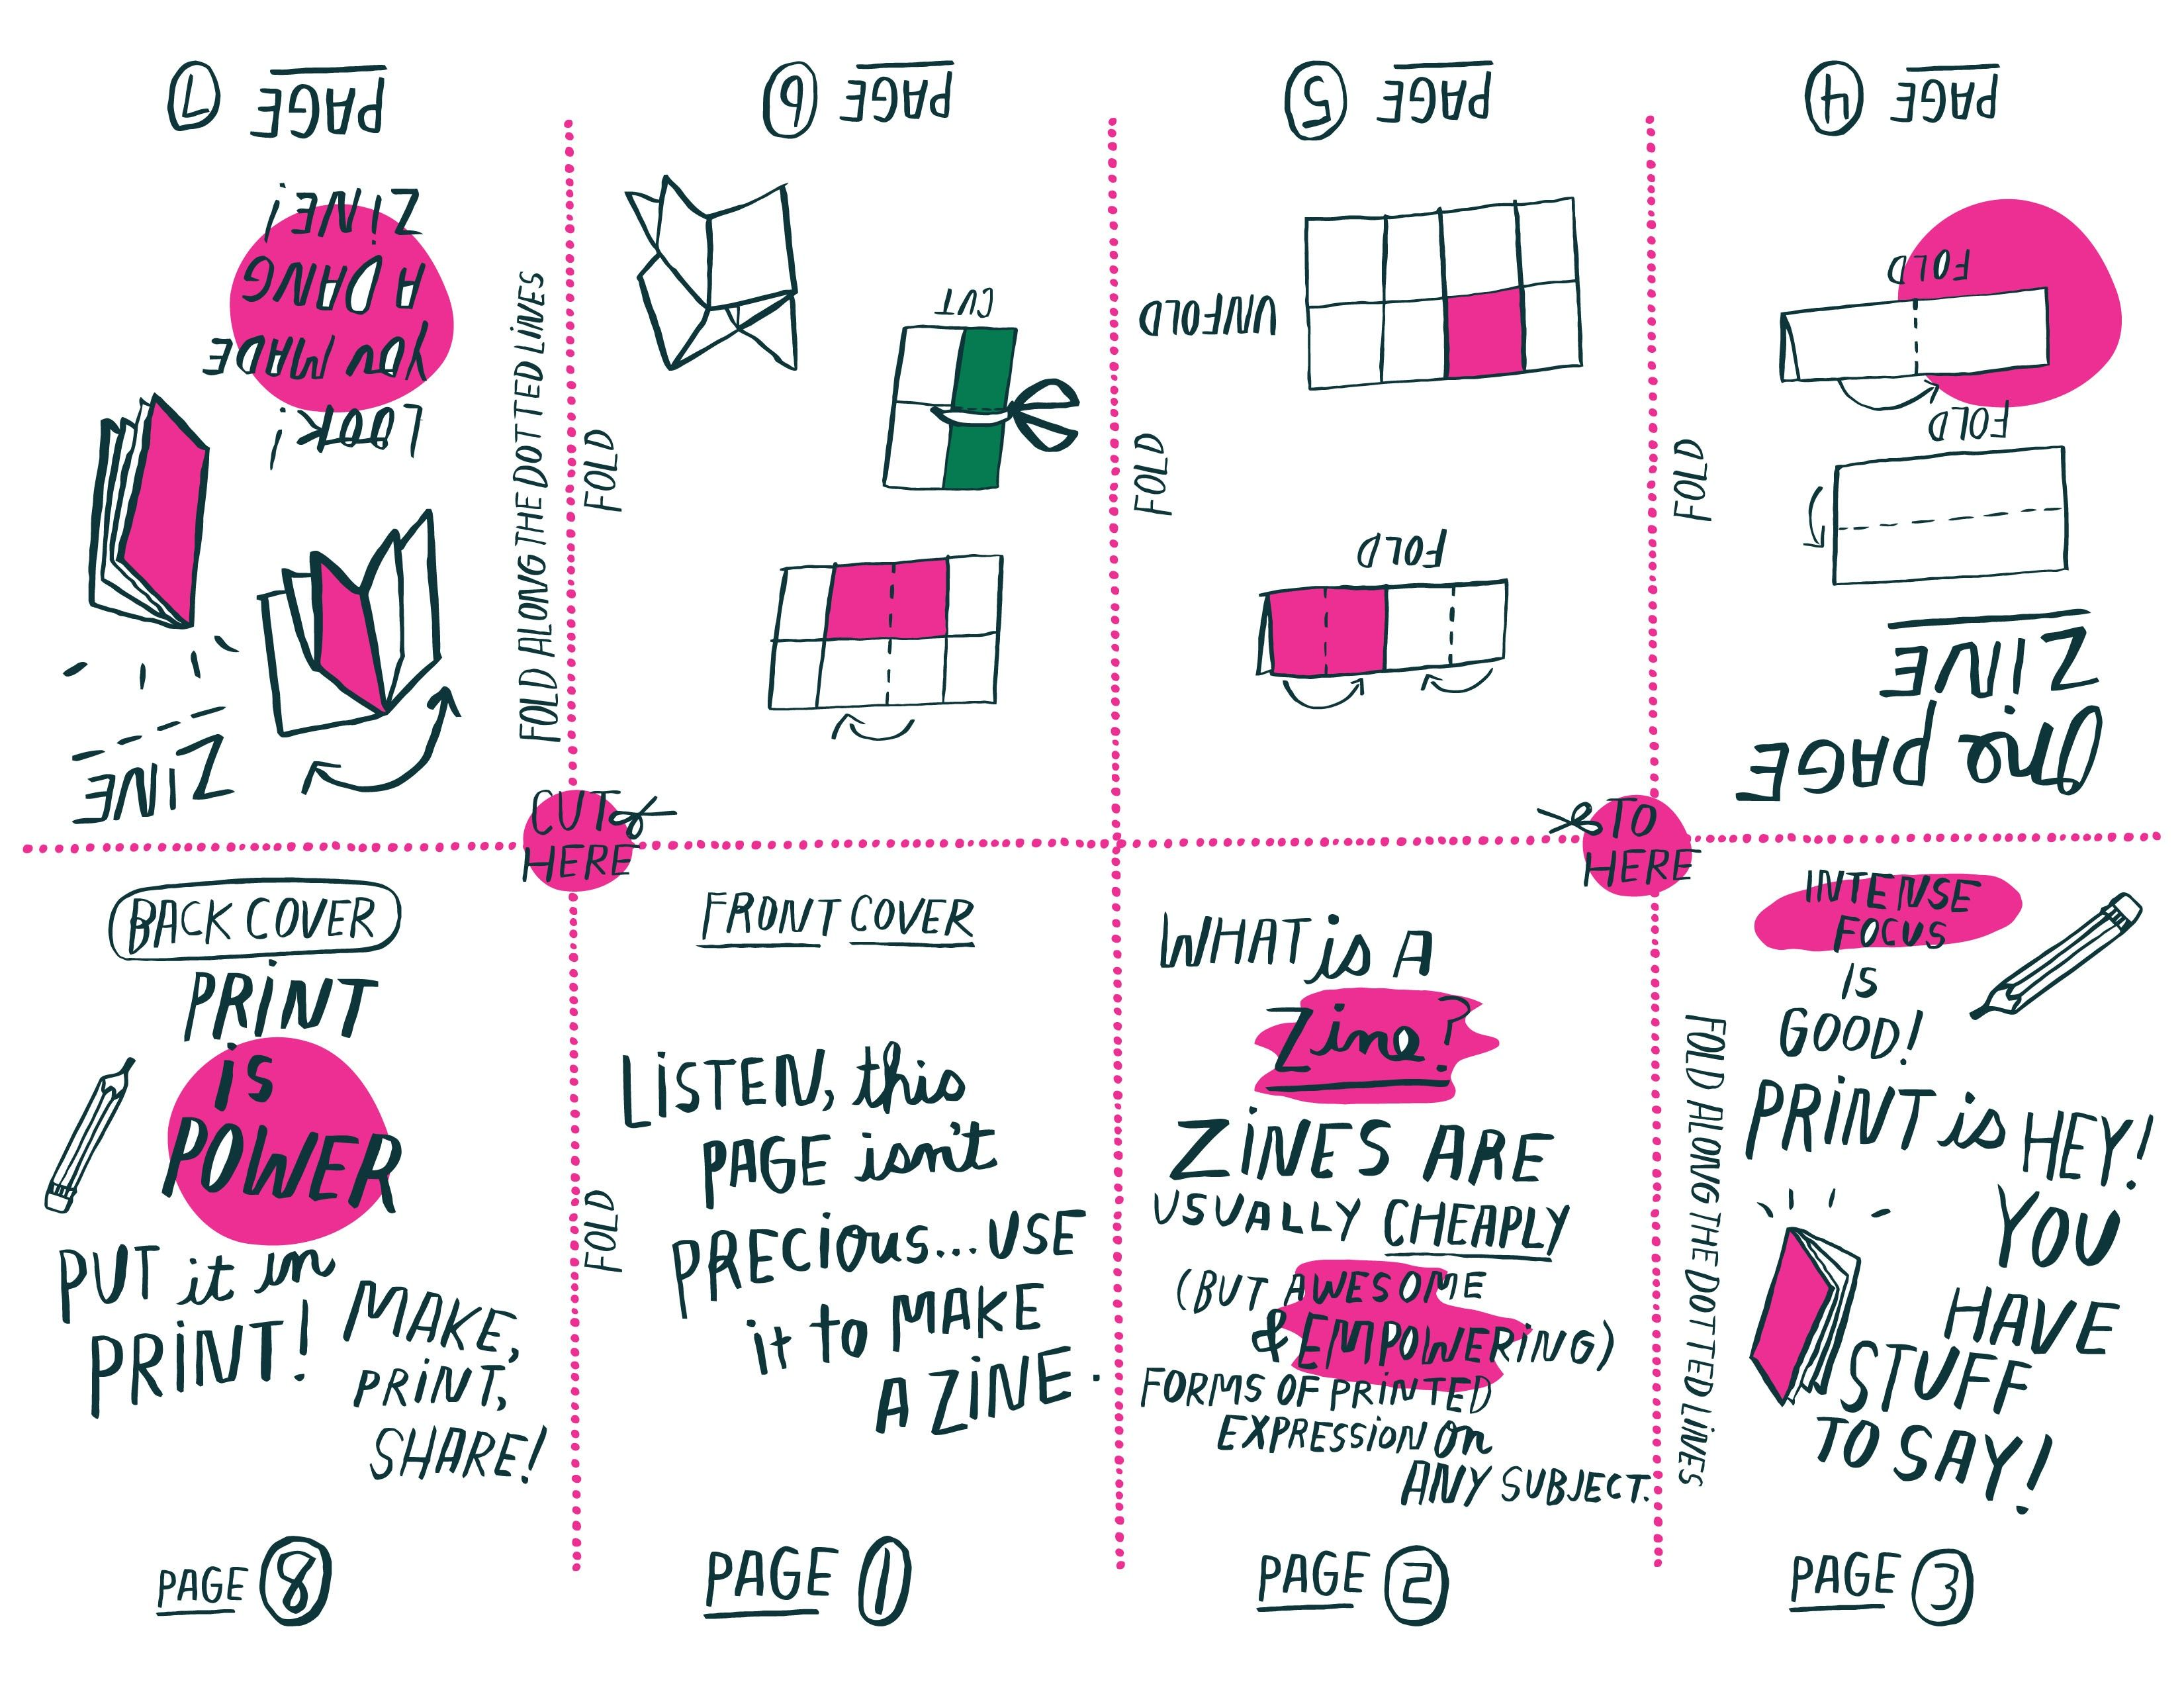 one sheet 8 page zine template | Zines | Pinterest